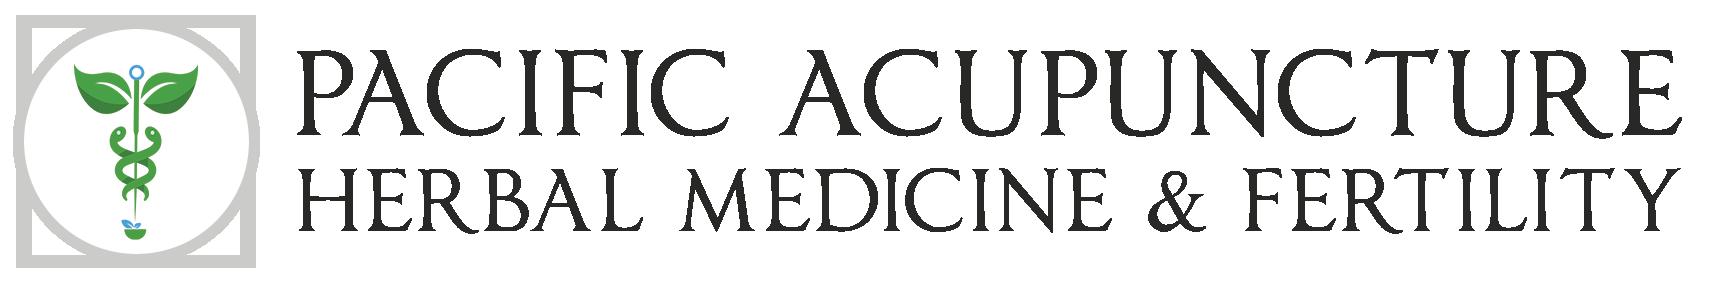 Pacific Acupuncture - Herbal Medicine & Fertility Logo